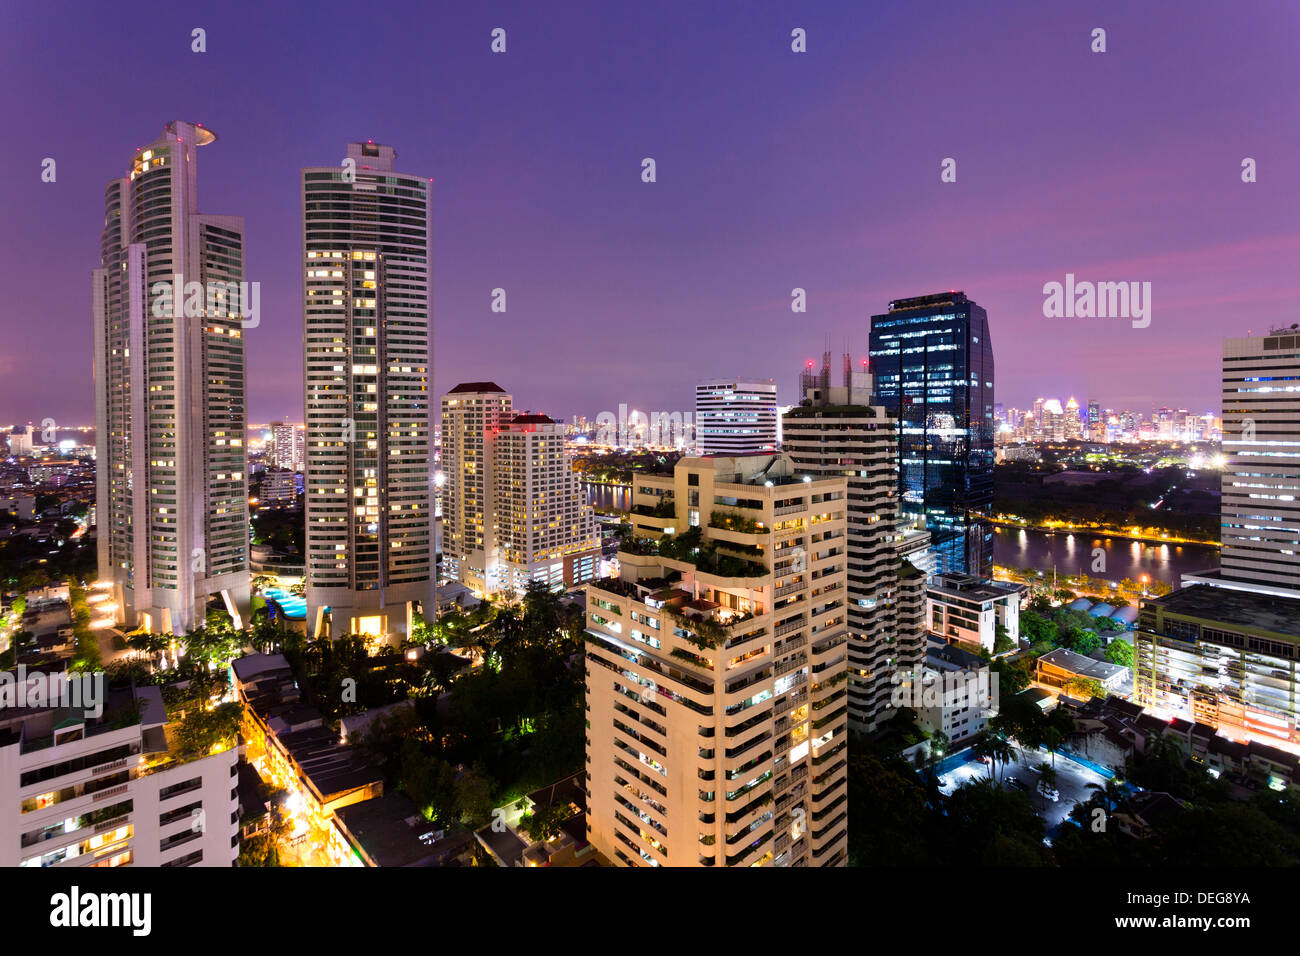 High rise buildings of Bangkok at night from Rembrandt Hotel and Towers, Sukhumvit 18, Bangkok, Thailand, Southeast - Stock Image